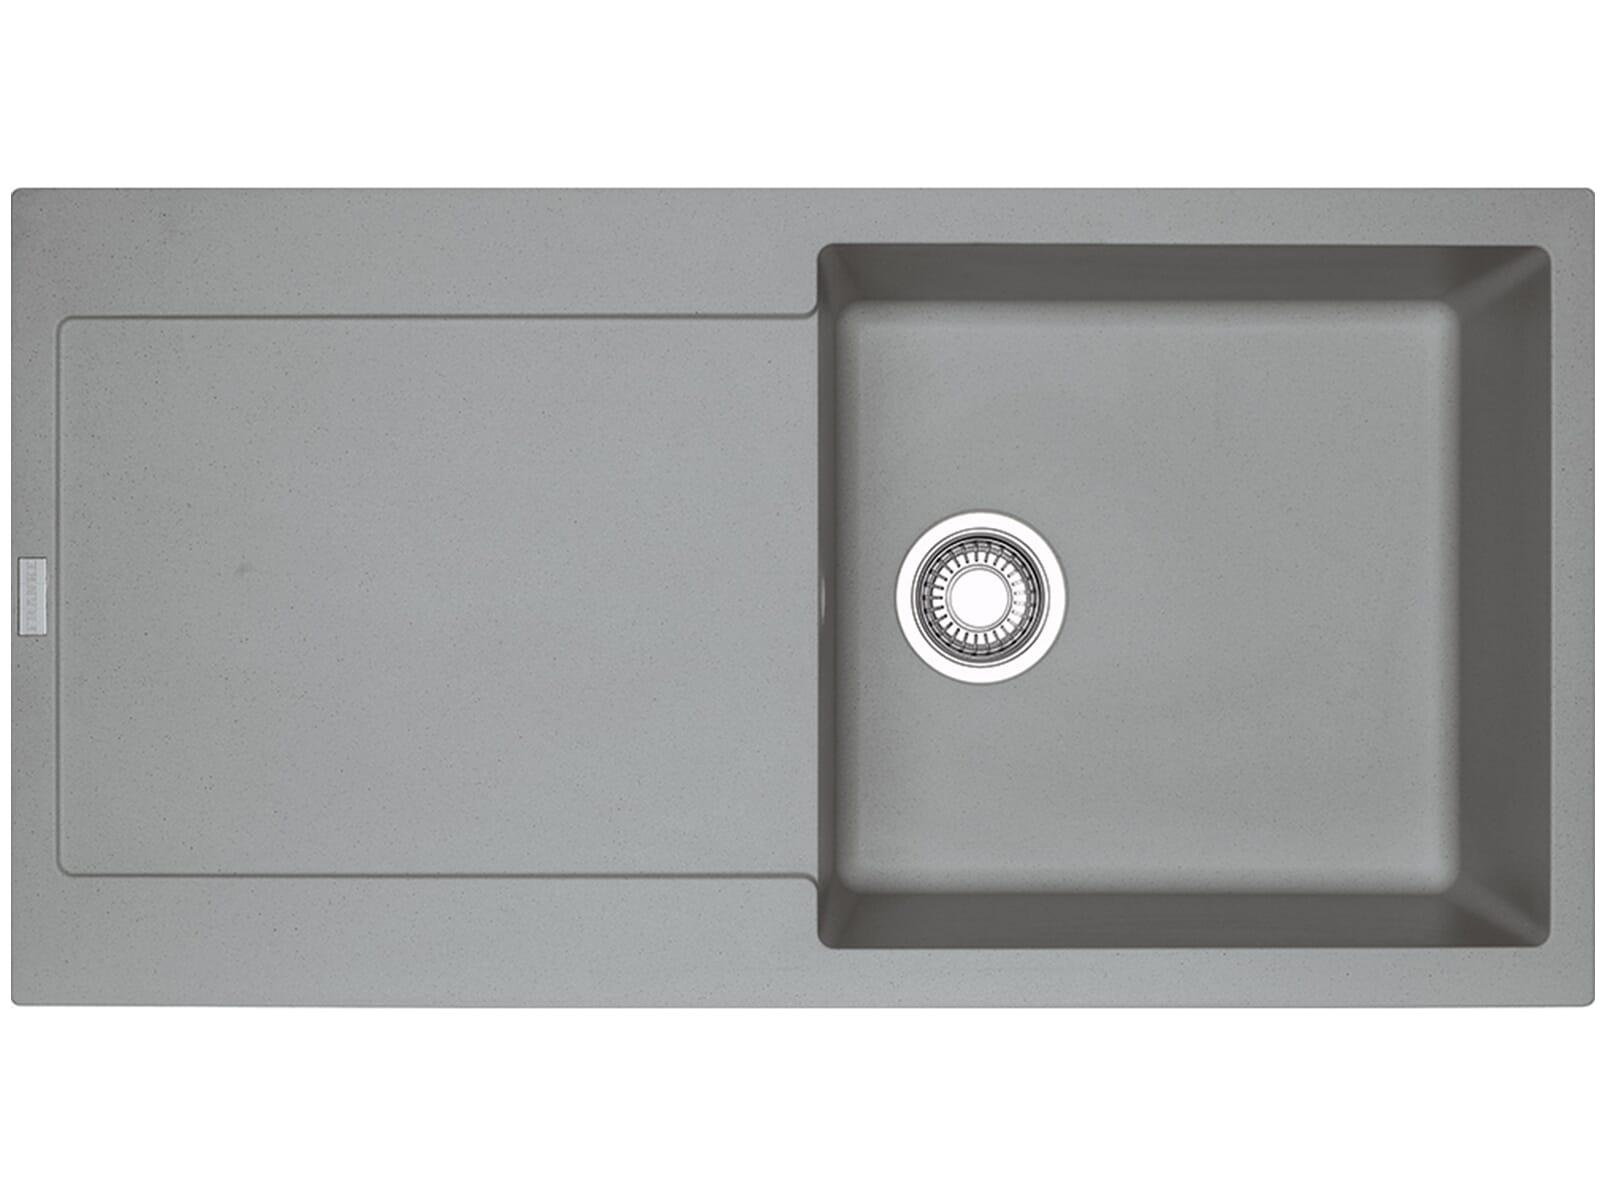 Franke Maris MRG 211 Steingrau - 135.0477.312 Granitspüle Exzenterbetätigung